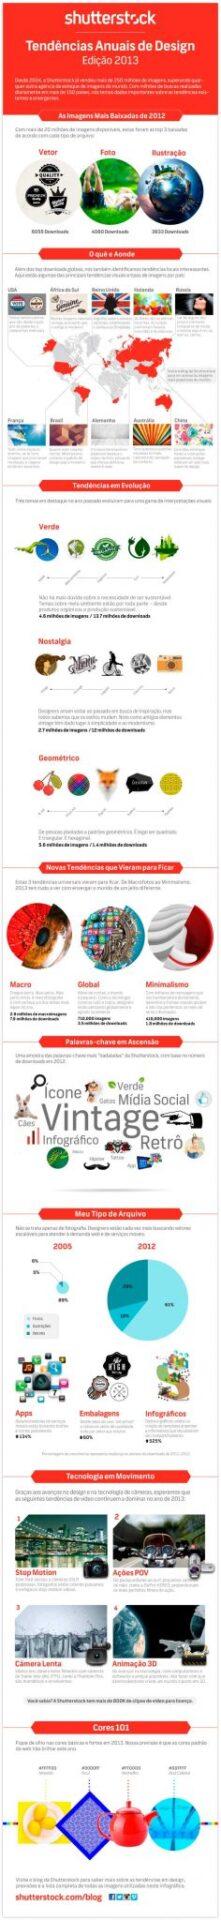 Tendências Globais de Design – Shutterstock 2013